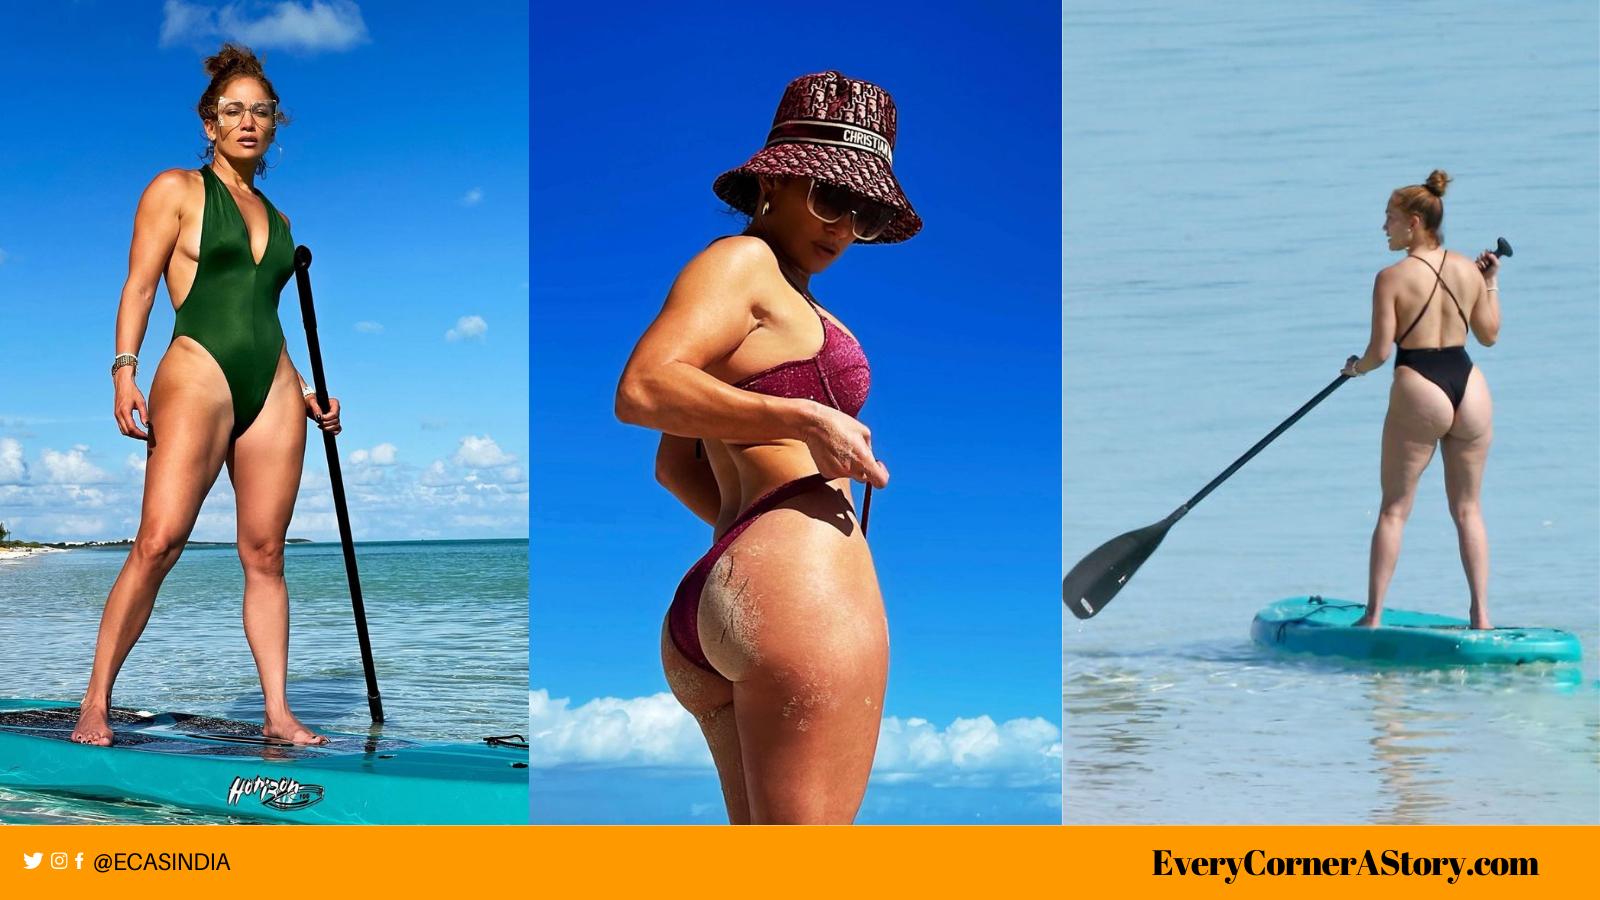 jennifer lopez hot bikini photo skimpy swimsuit every corner a story jlo beach